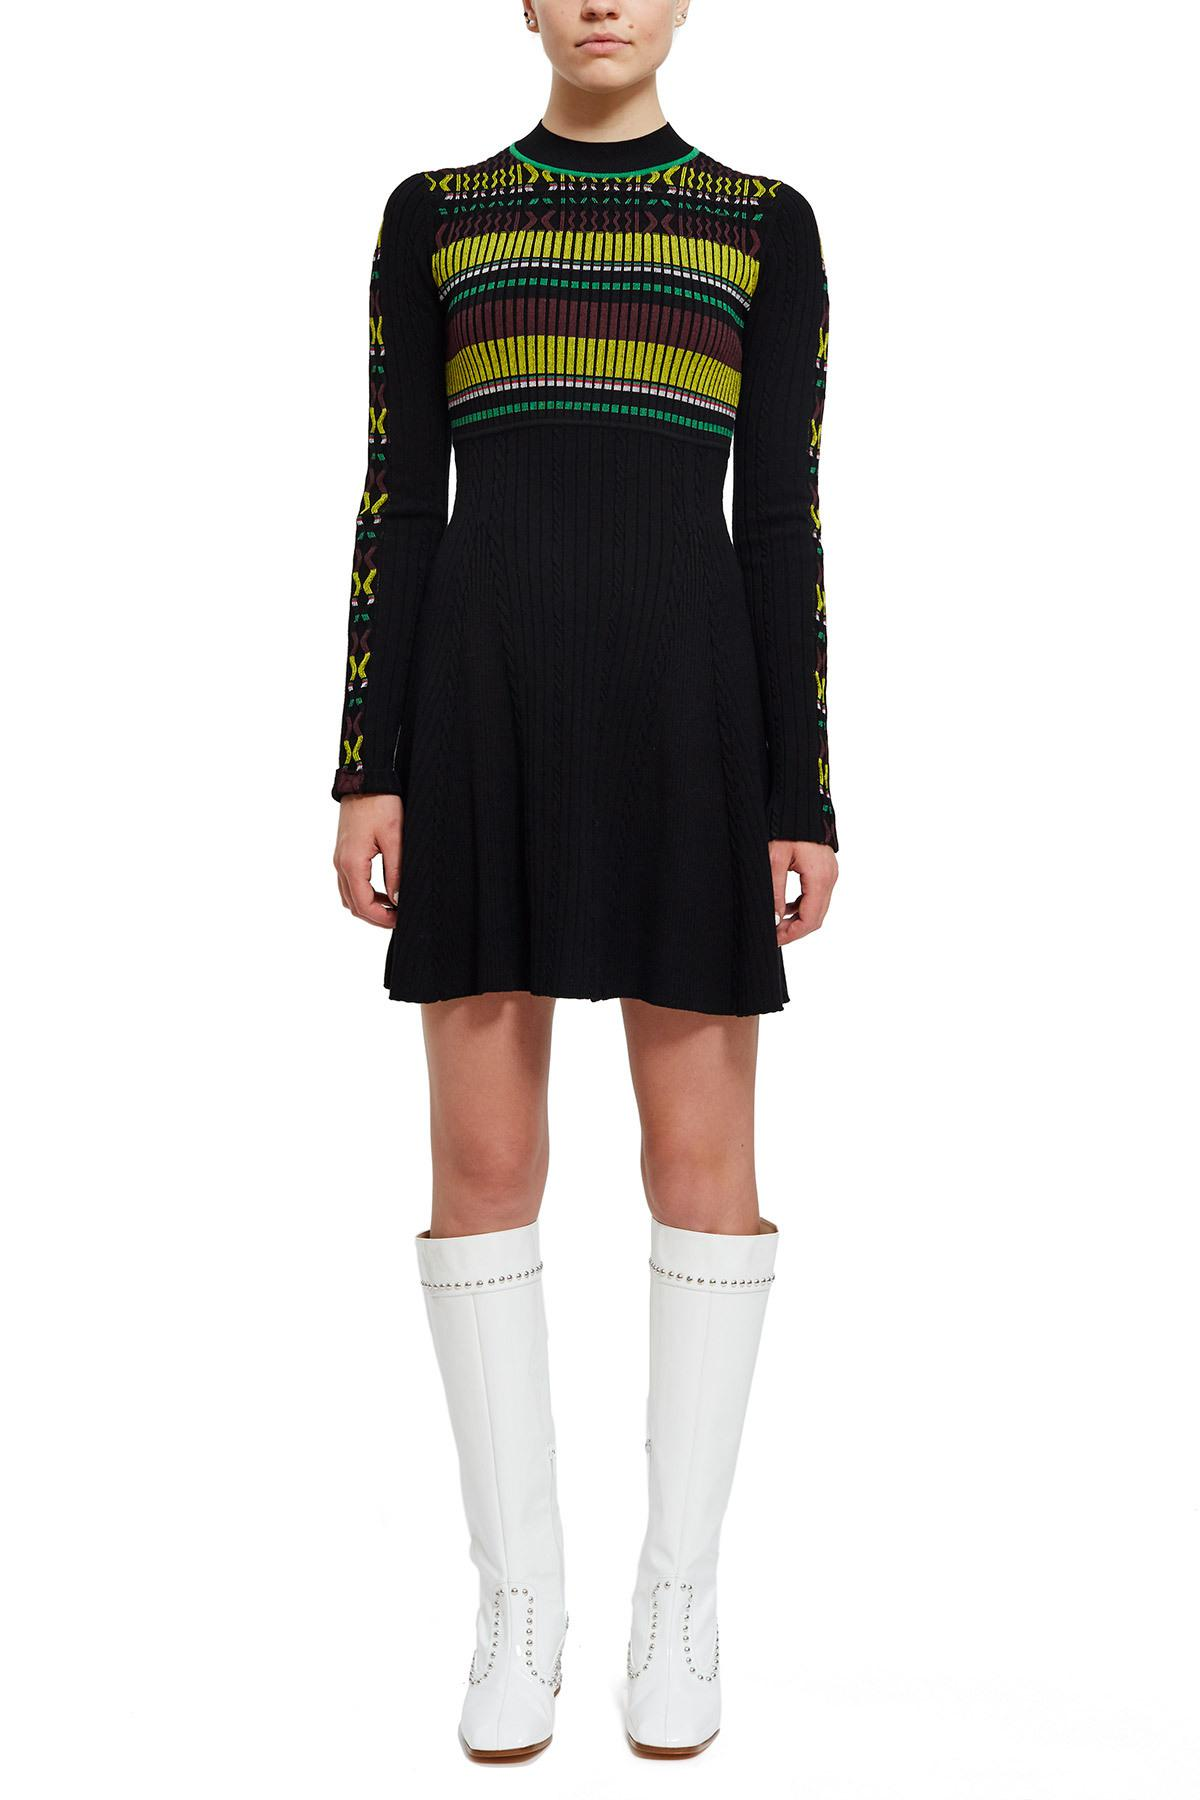 bbfcdcc837c5 Opening Ceremony Rib Stripe Flare Dress in Black - Save 70% - Lyst